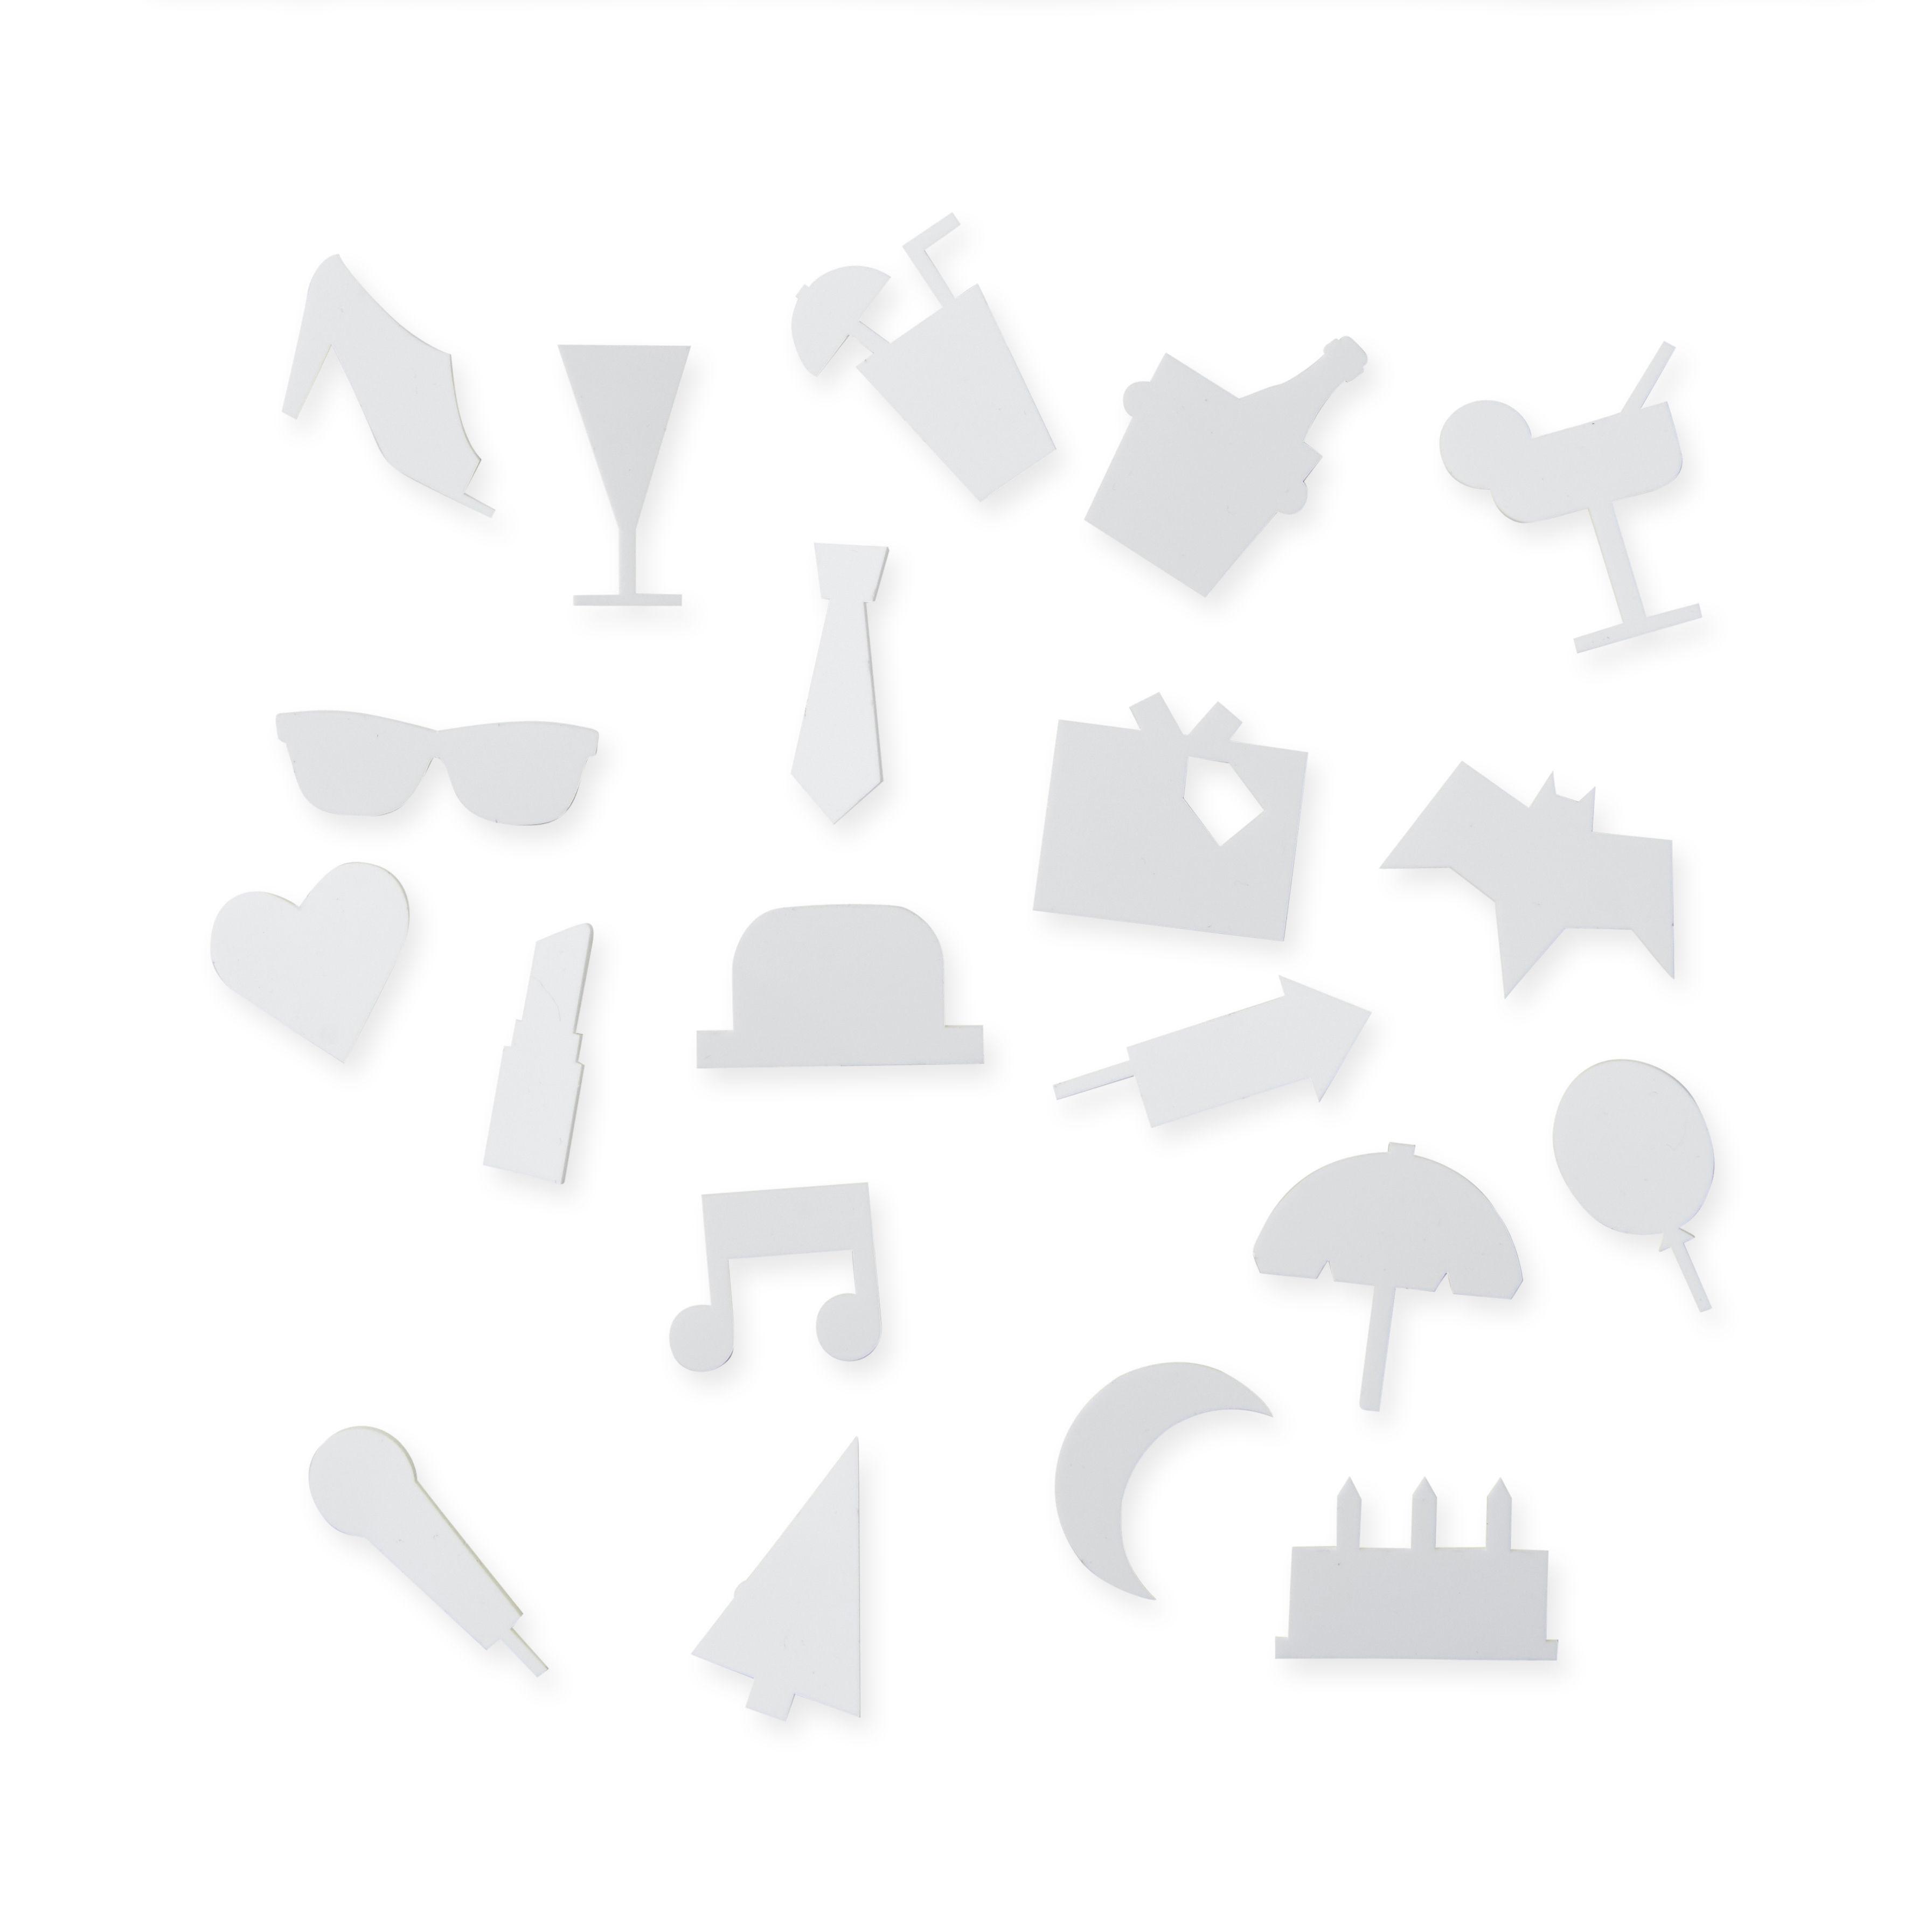 Decoration - Memo Boards & Calendars  - Symboles Party Set - / pour tableau perforé by Design Letters - Blanc - ABS, Polymethyl methacrylate